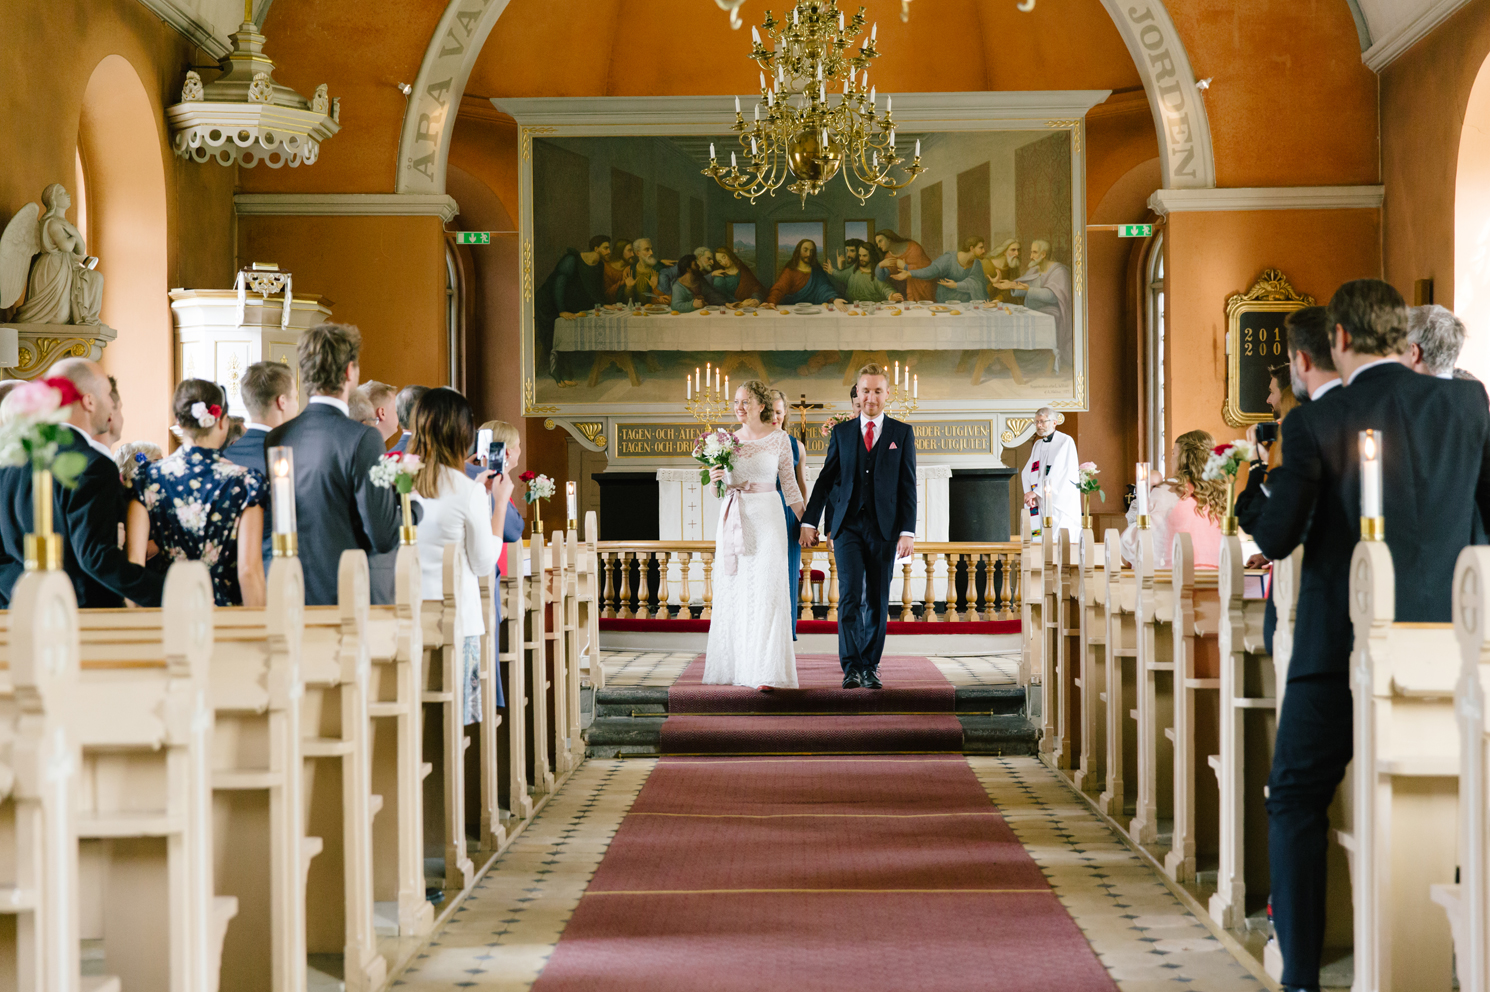 brollopsfotografering-maria-o-photo-vigsel-ortofta-slott-ortofta-kyrka-5